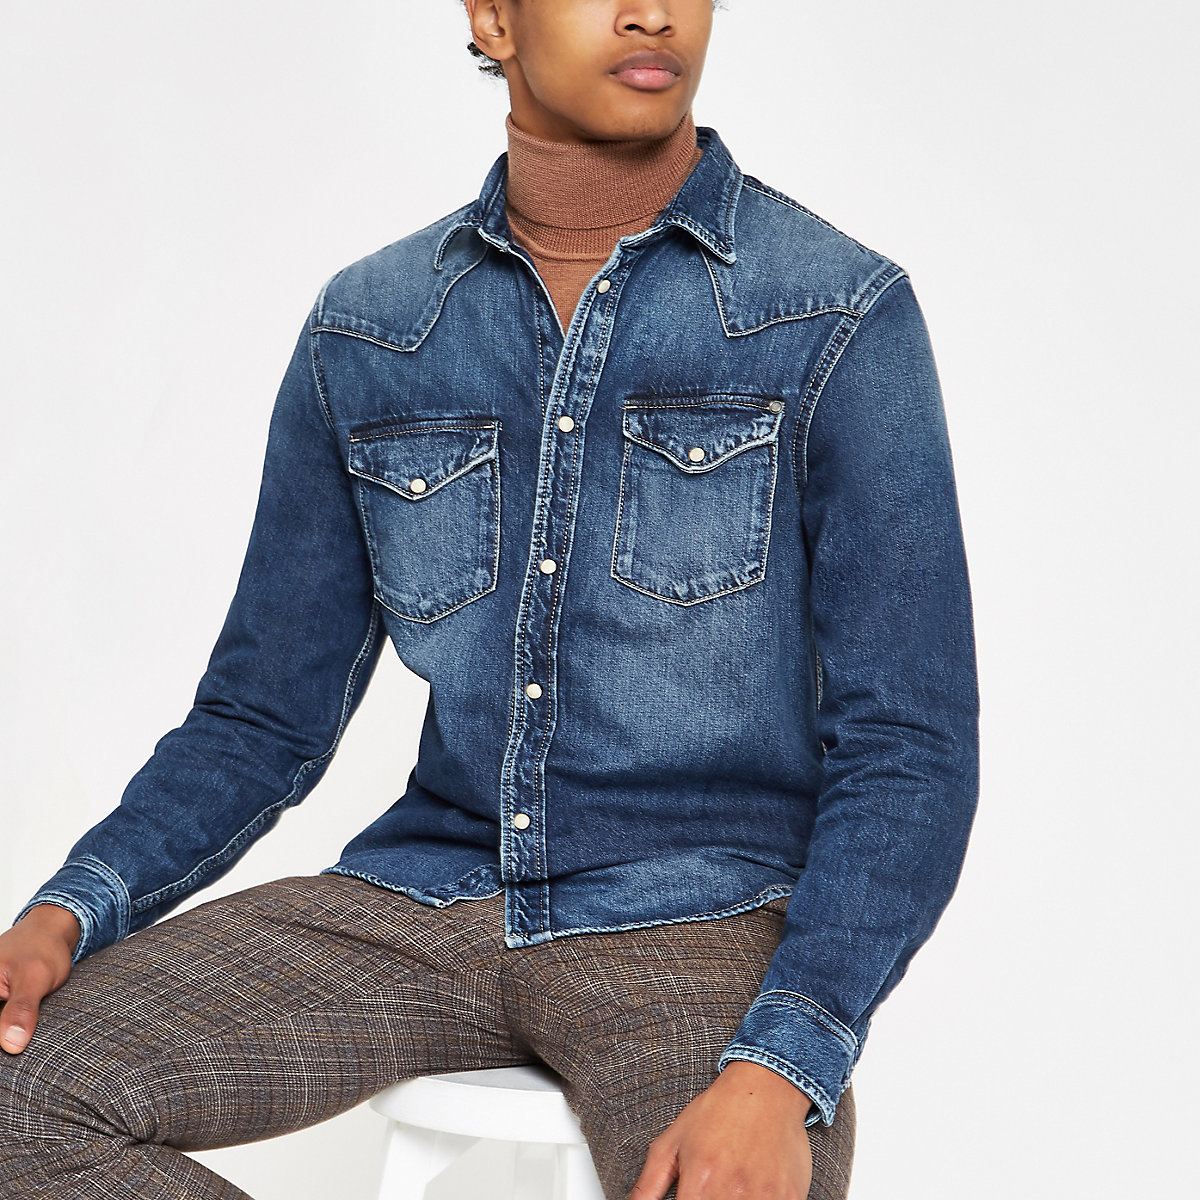 Pepe Jeans blue denim shirt